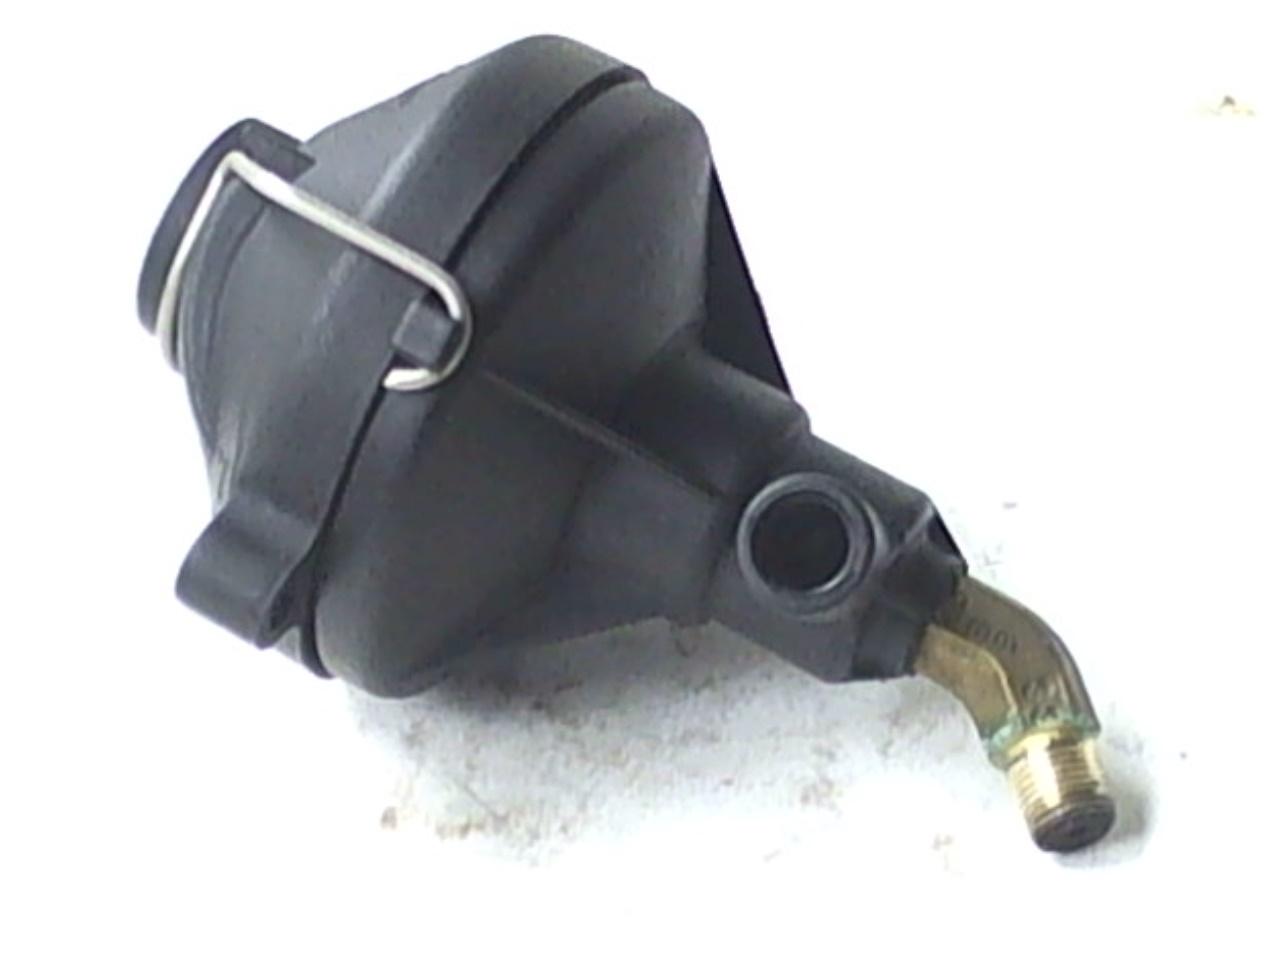 seadoo pressure regulator assembly waterbox water box valve 2000 2002 gtx rfi ebay. Black Bedroom Furniture Sets. Home Design Ideas